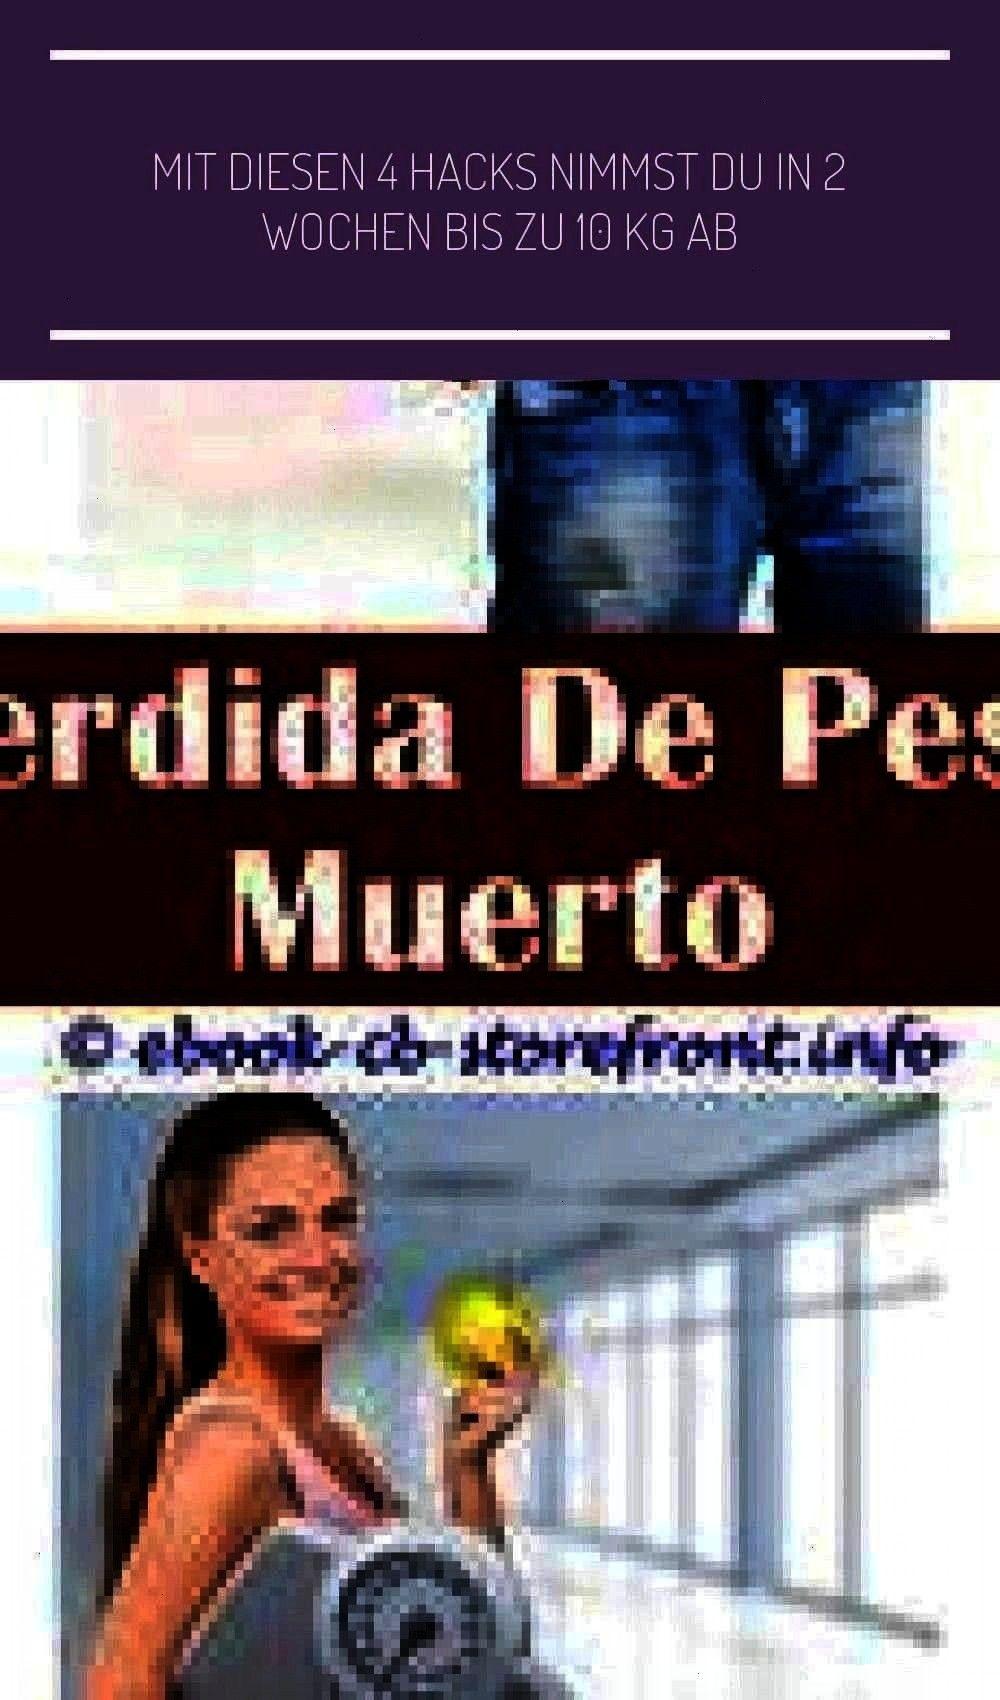 #stunnperdida #de9stunning #paratricks #stunning #pesotips #perdida #stunape #fitness #pesoand #diet...